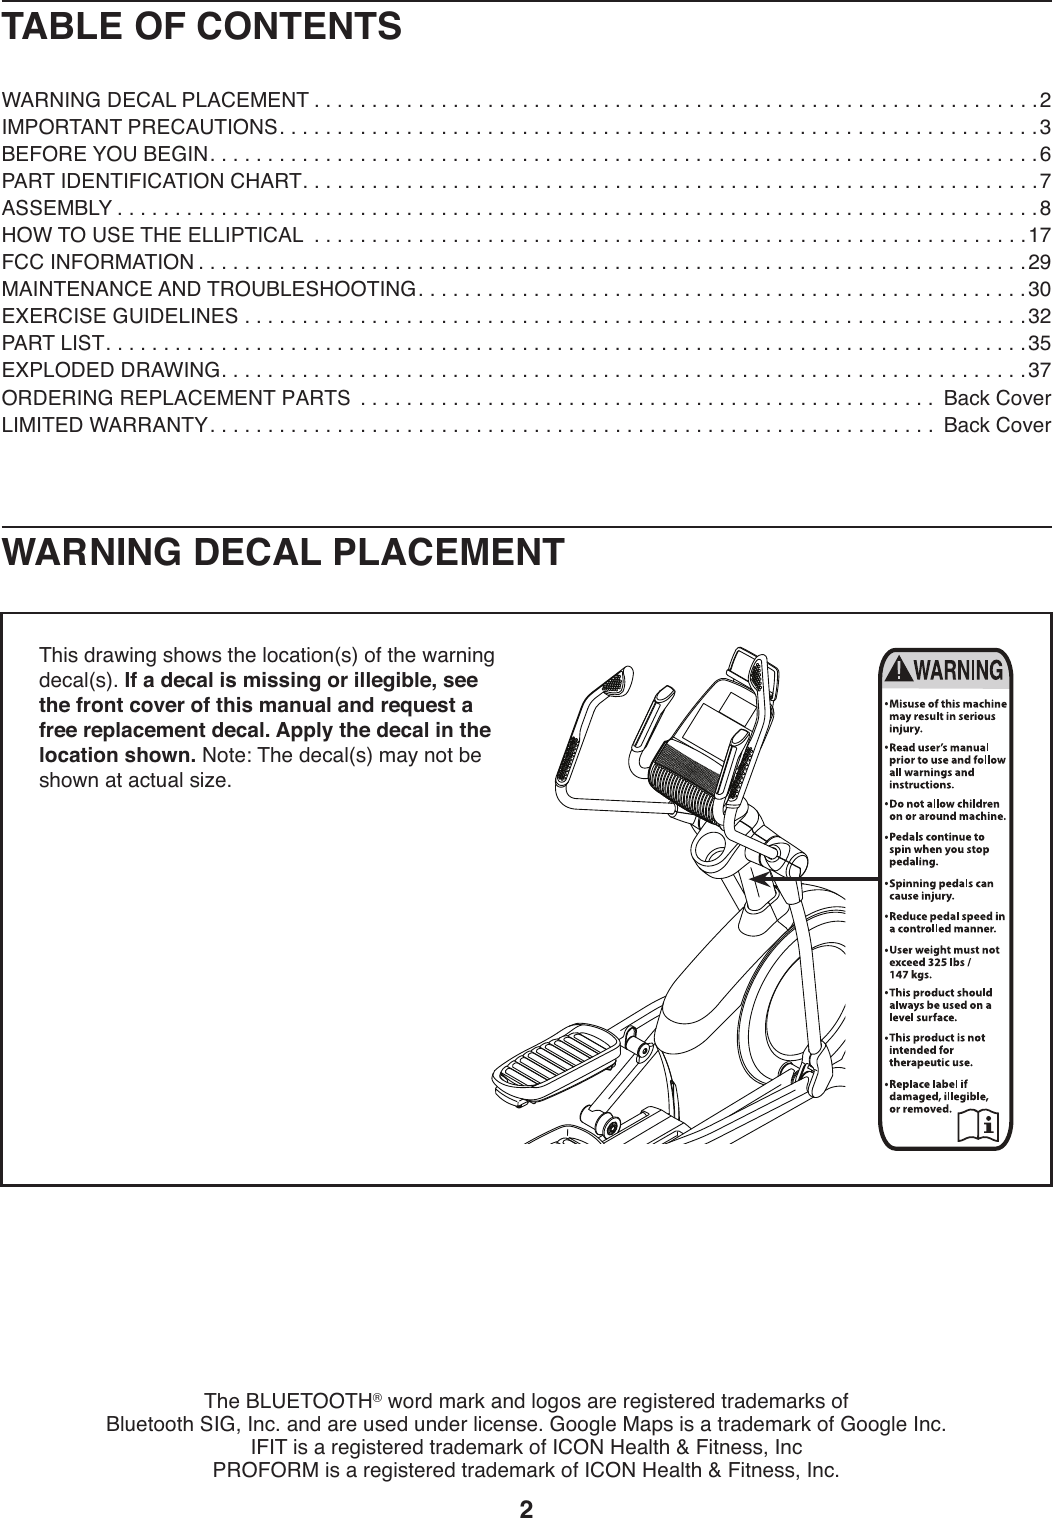 Proform Pfel579141 Endurance 720 E Elliptical Users Manual